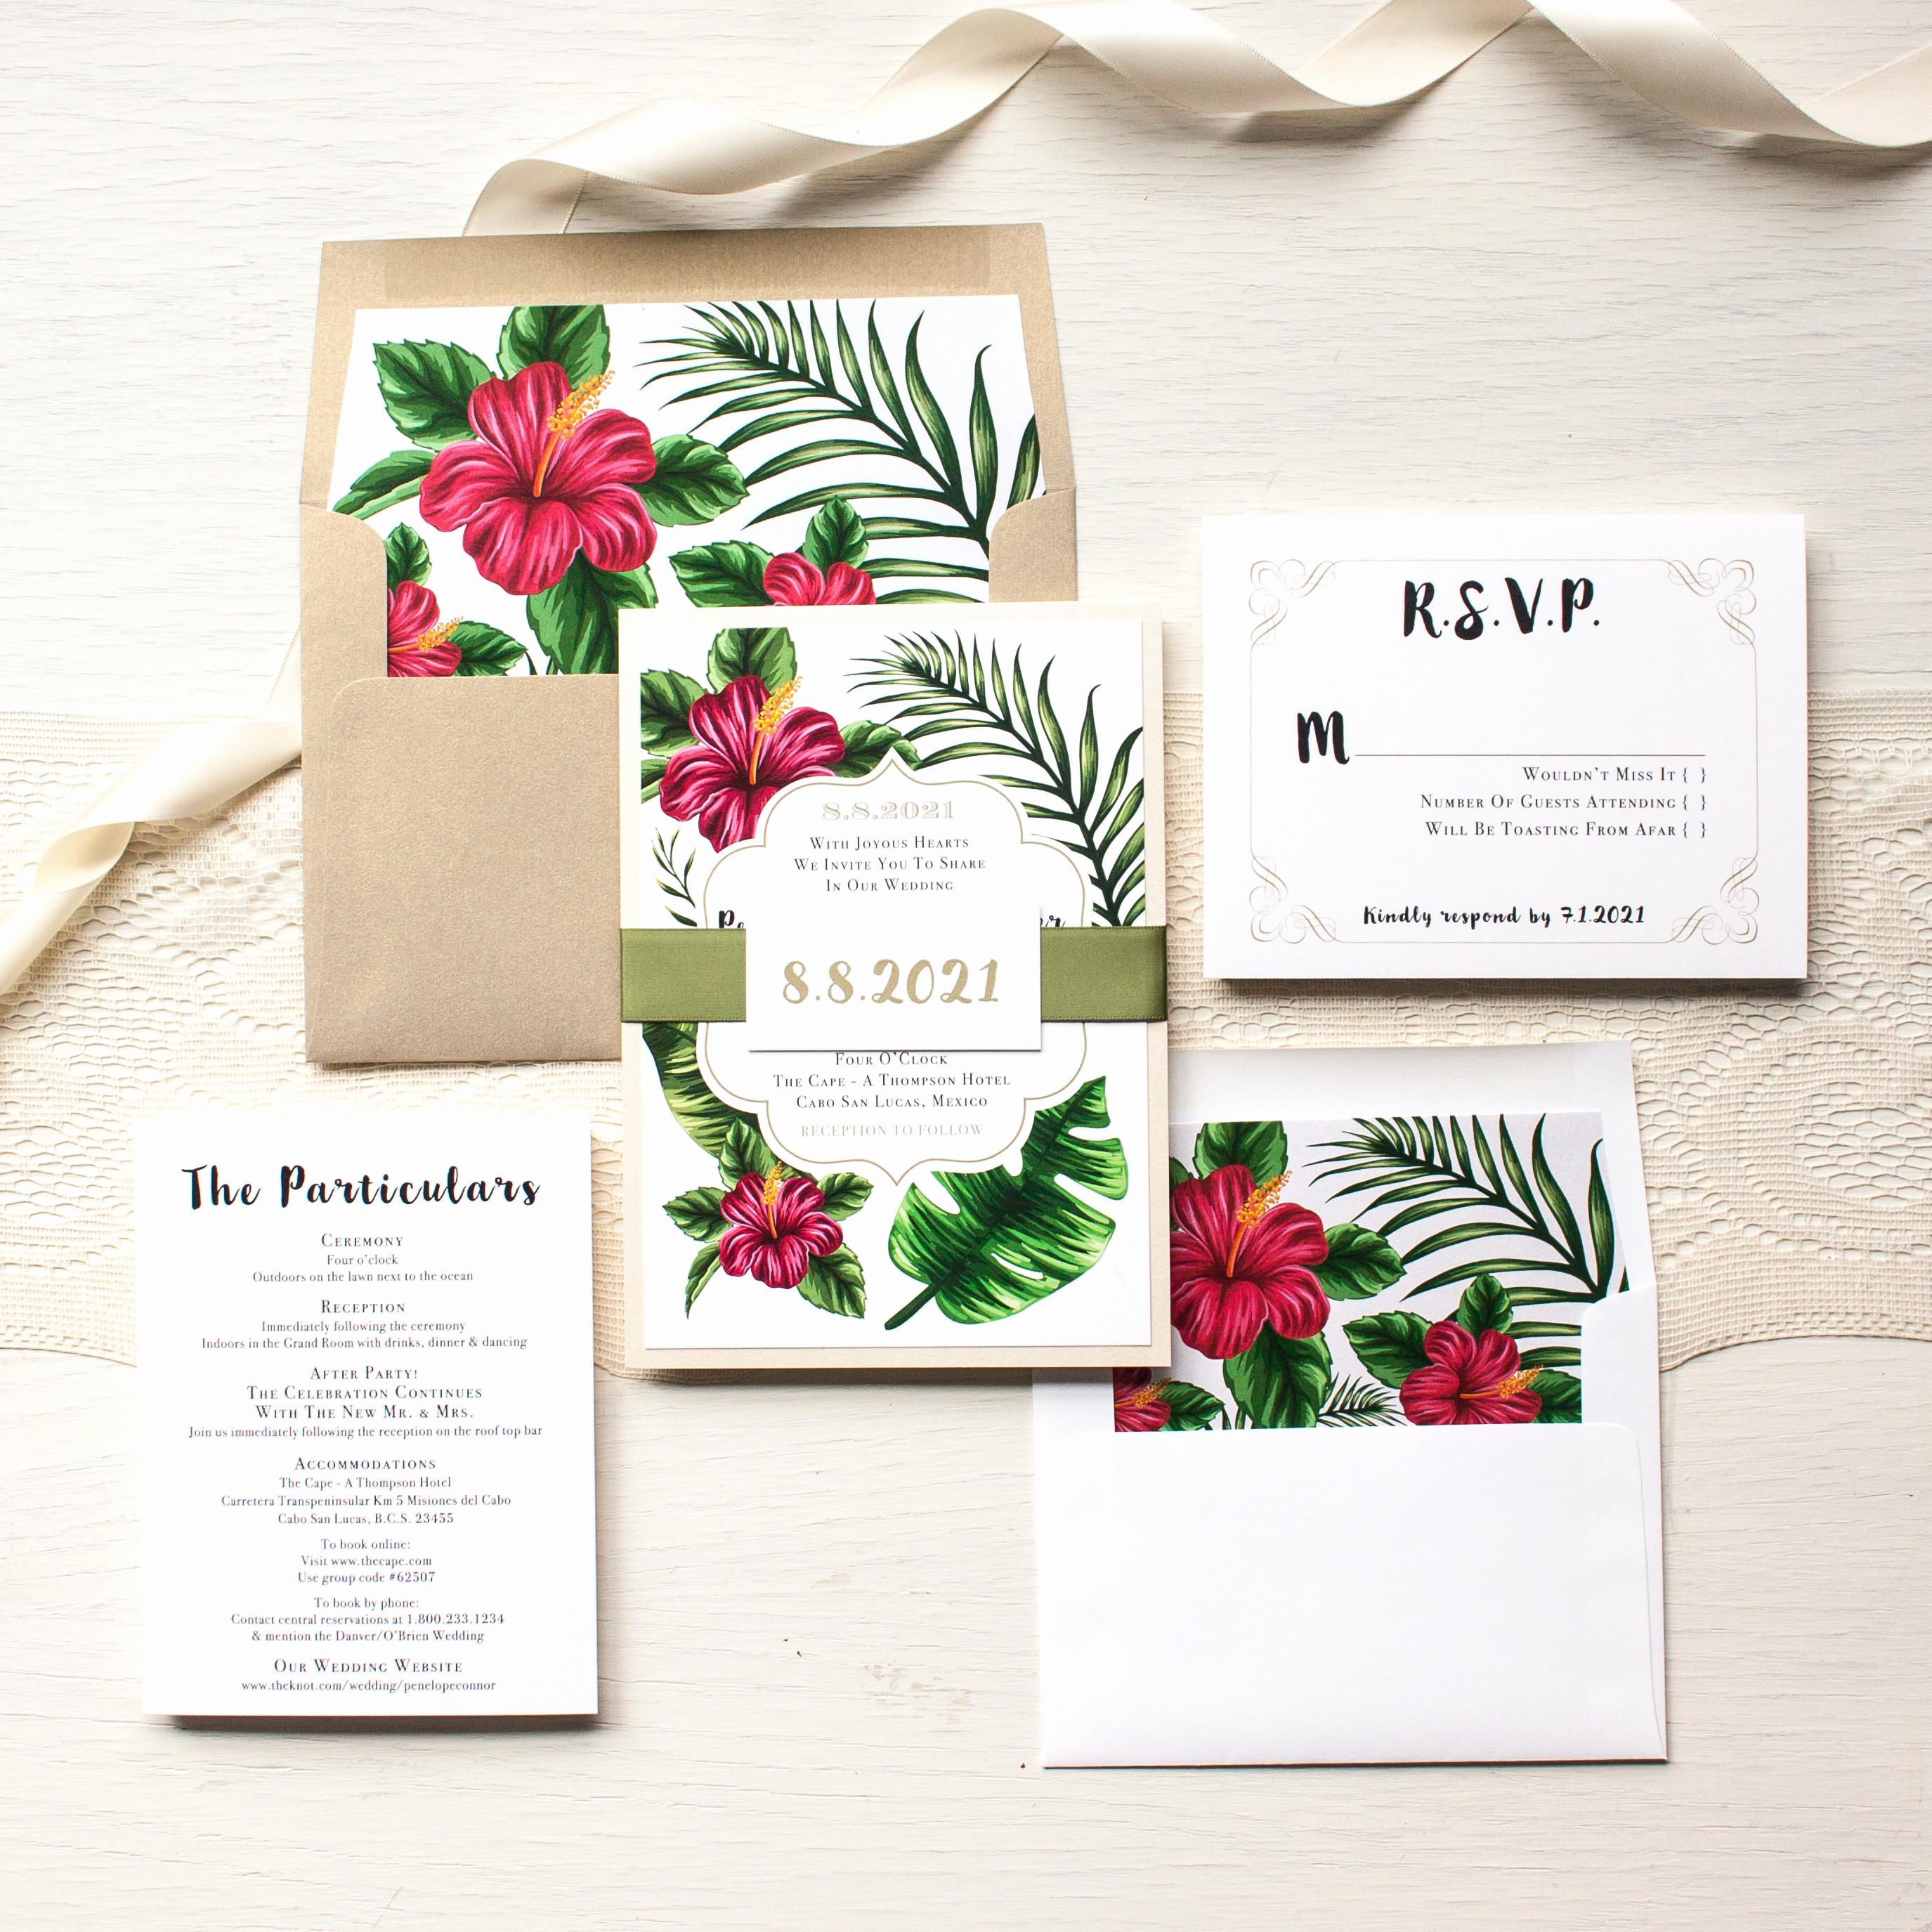 Swanky Soiree Events Event Design Wedding Planner Blog Swanky